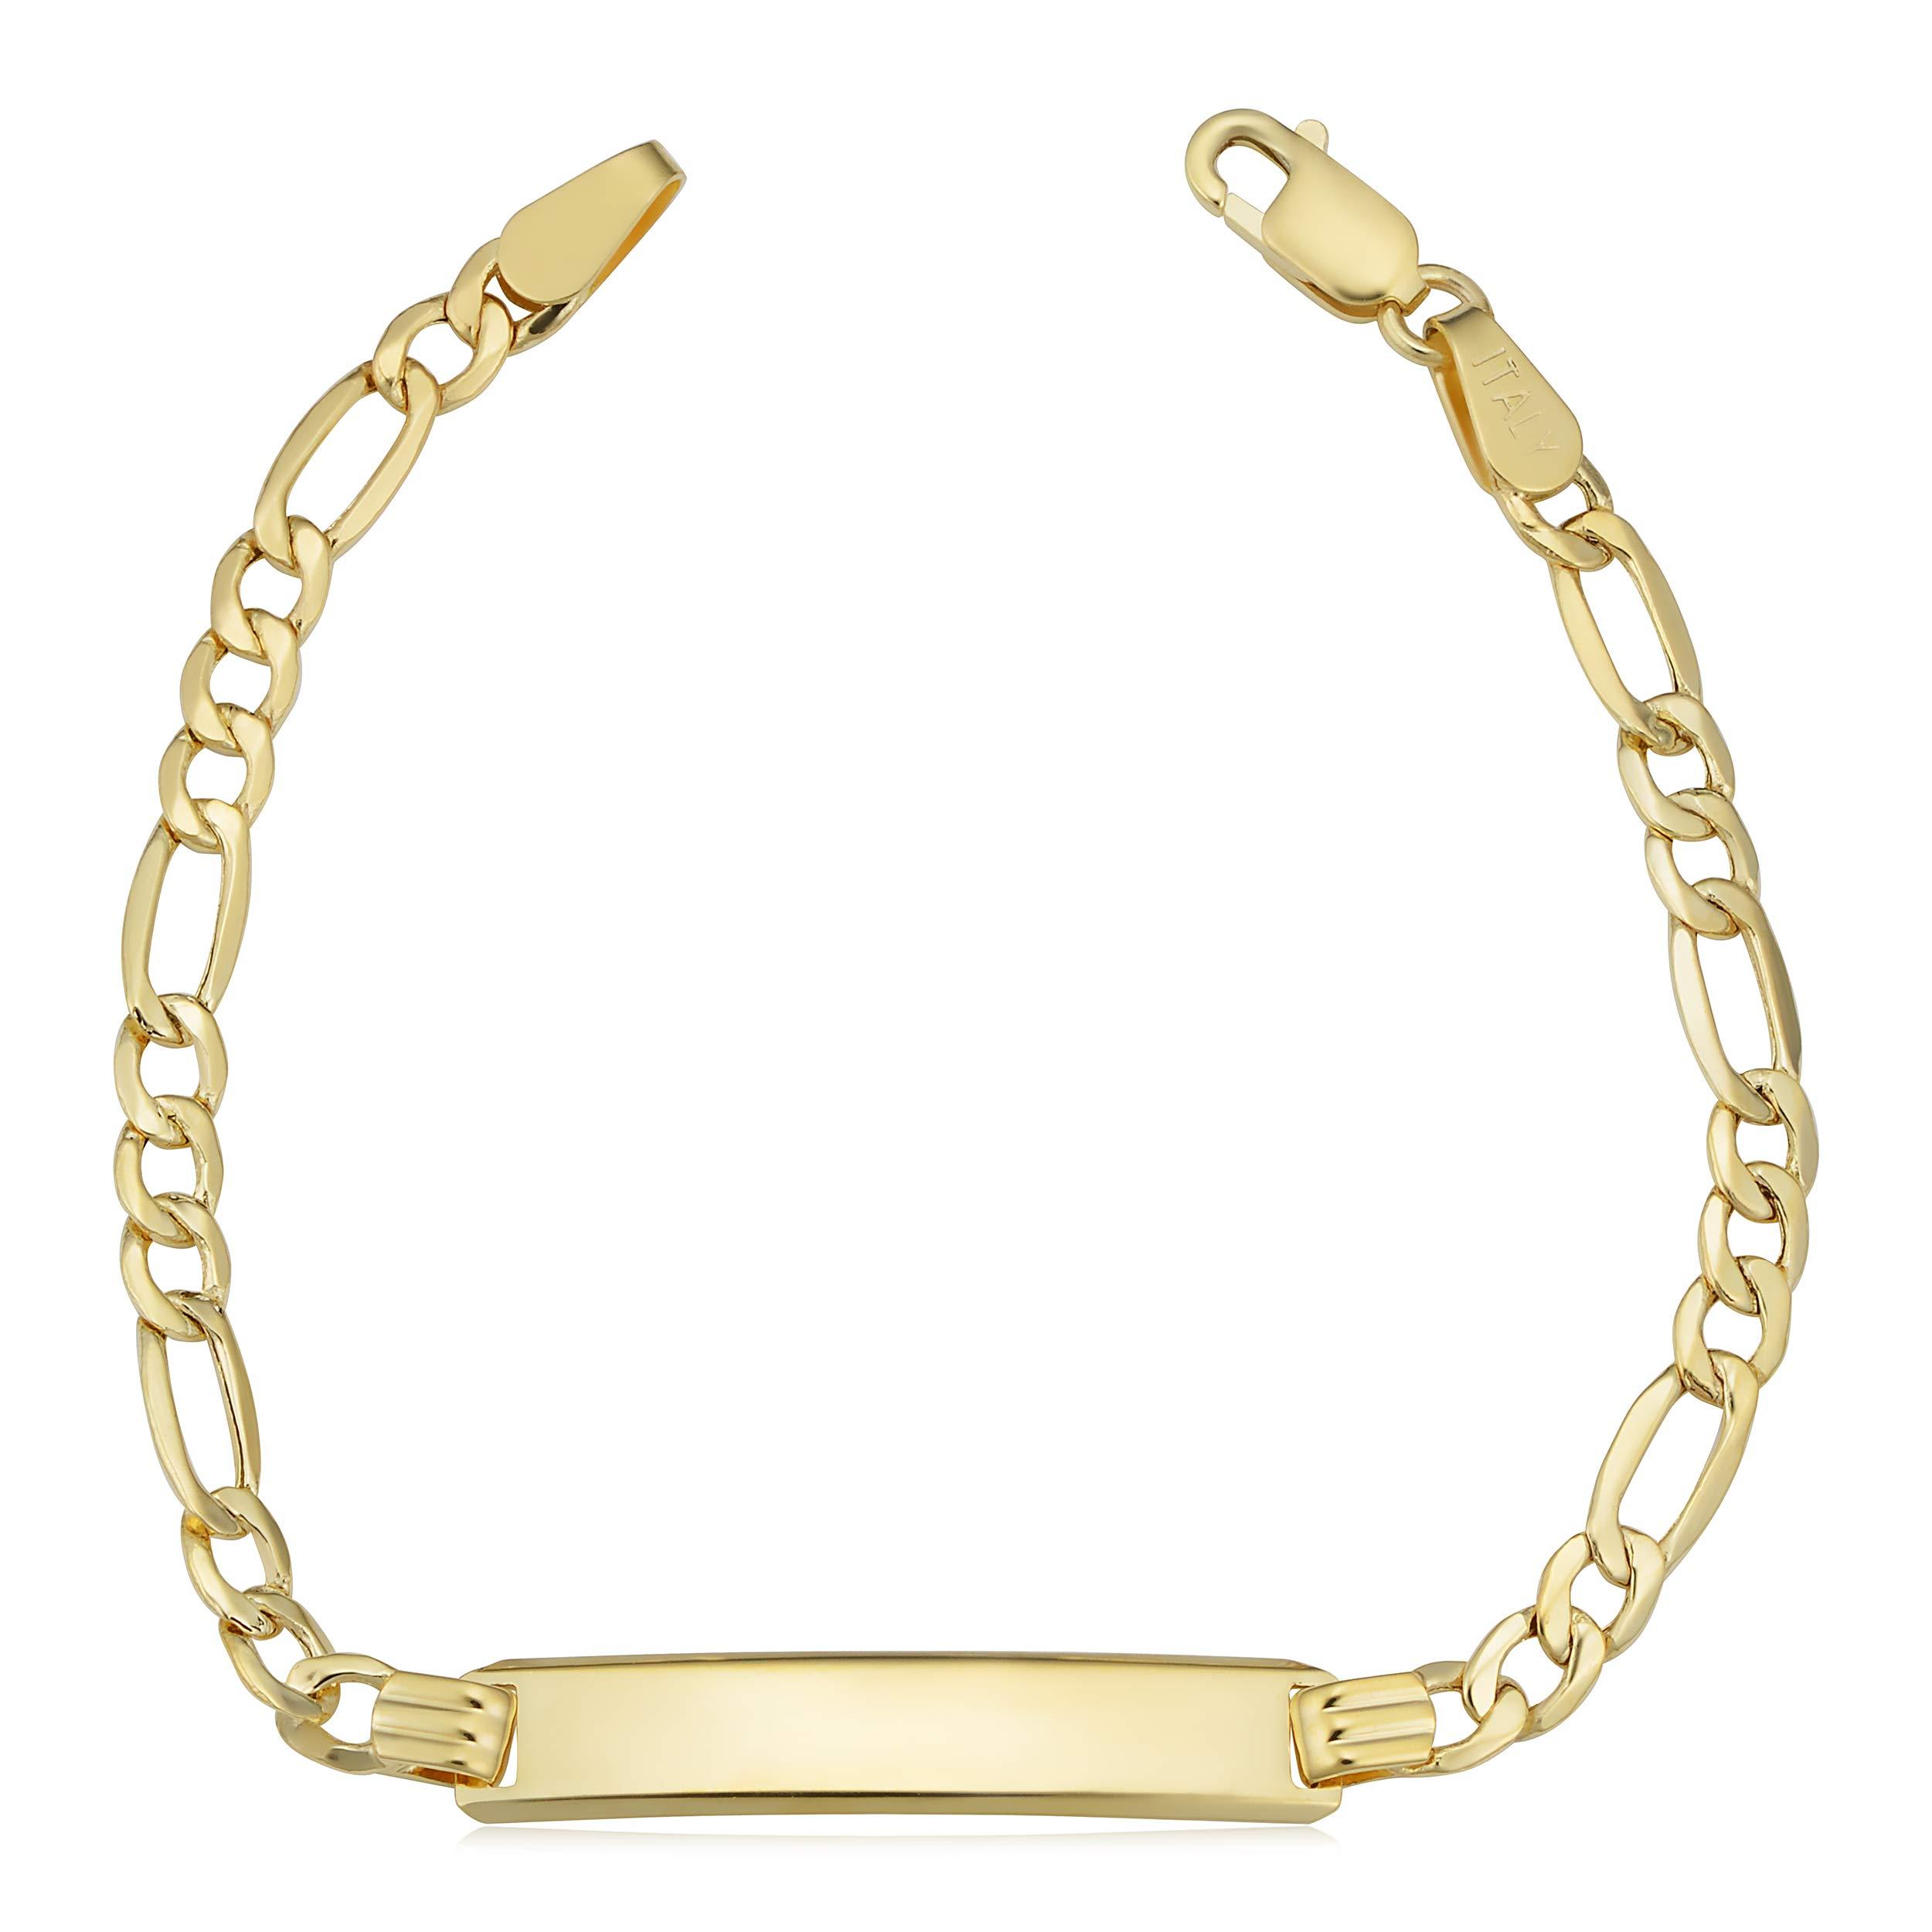 14k Yellow Gold High Polish Figaro ID Bracelet (5.5 inch)